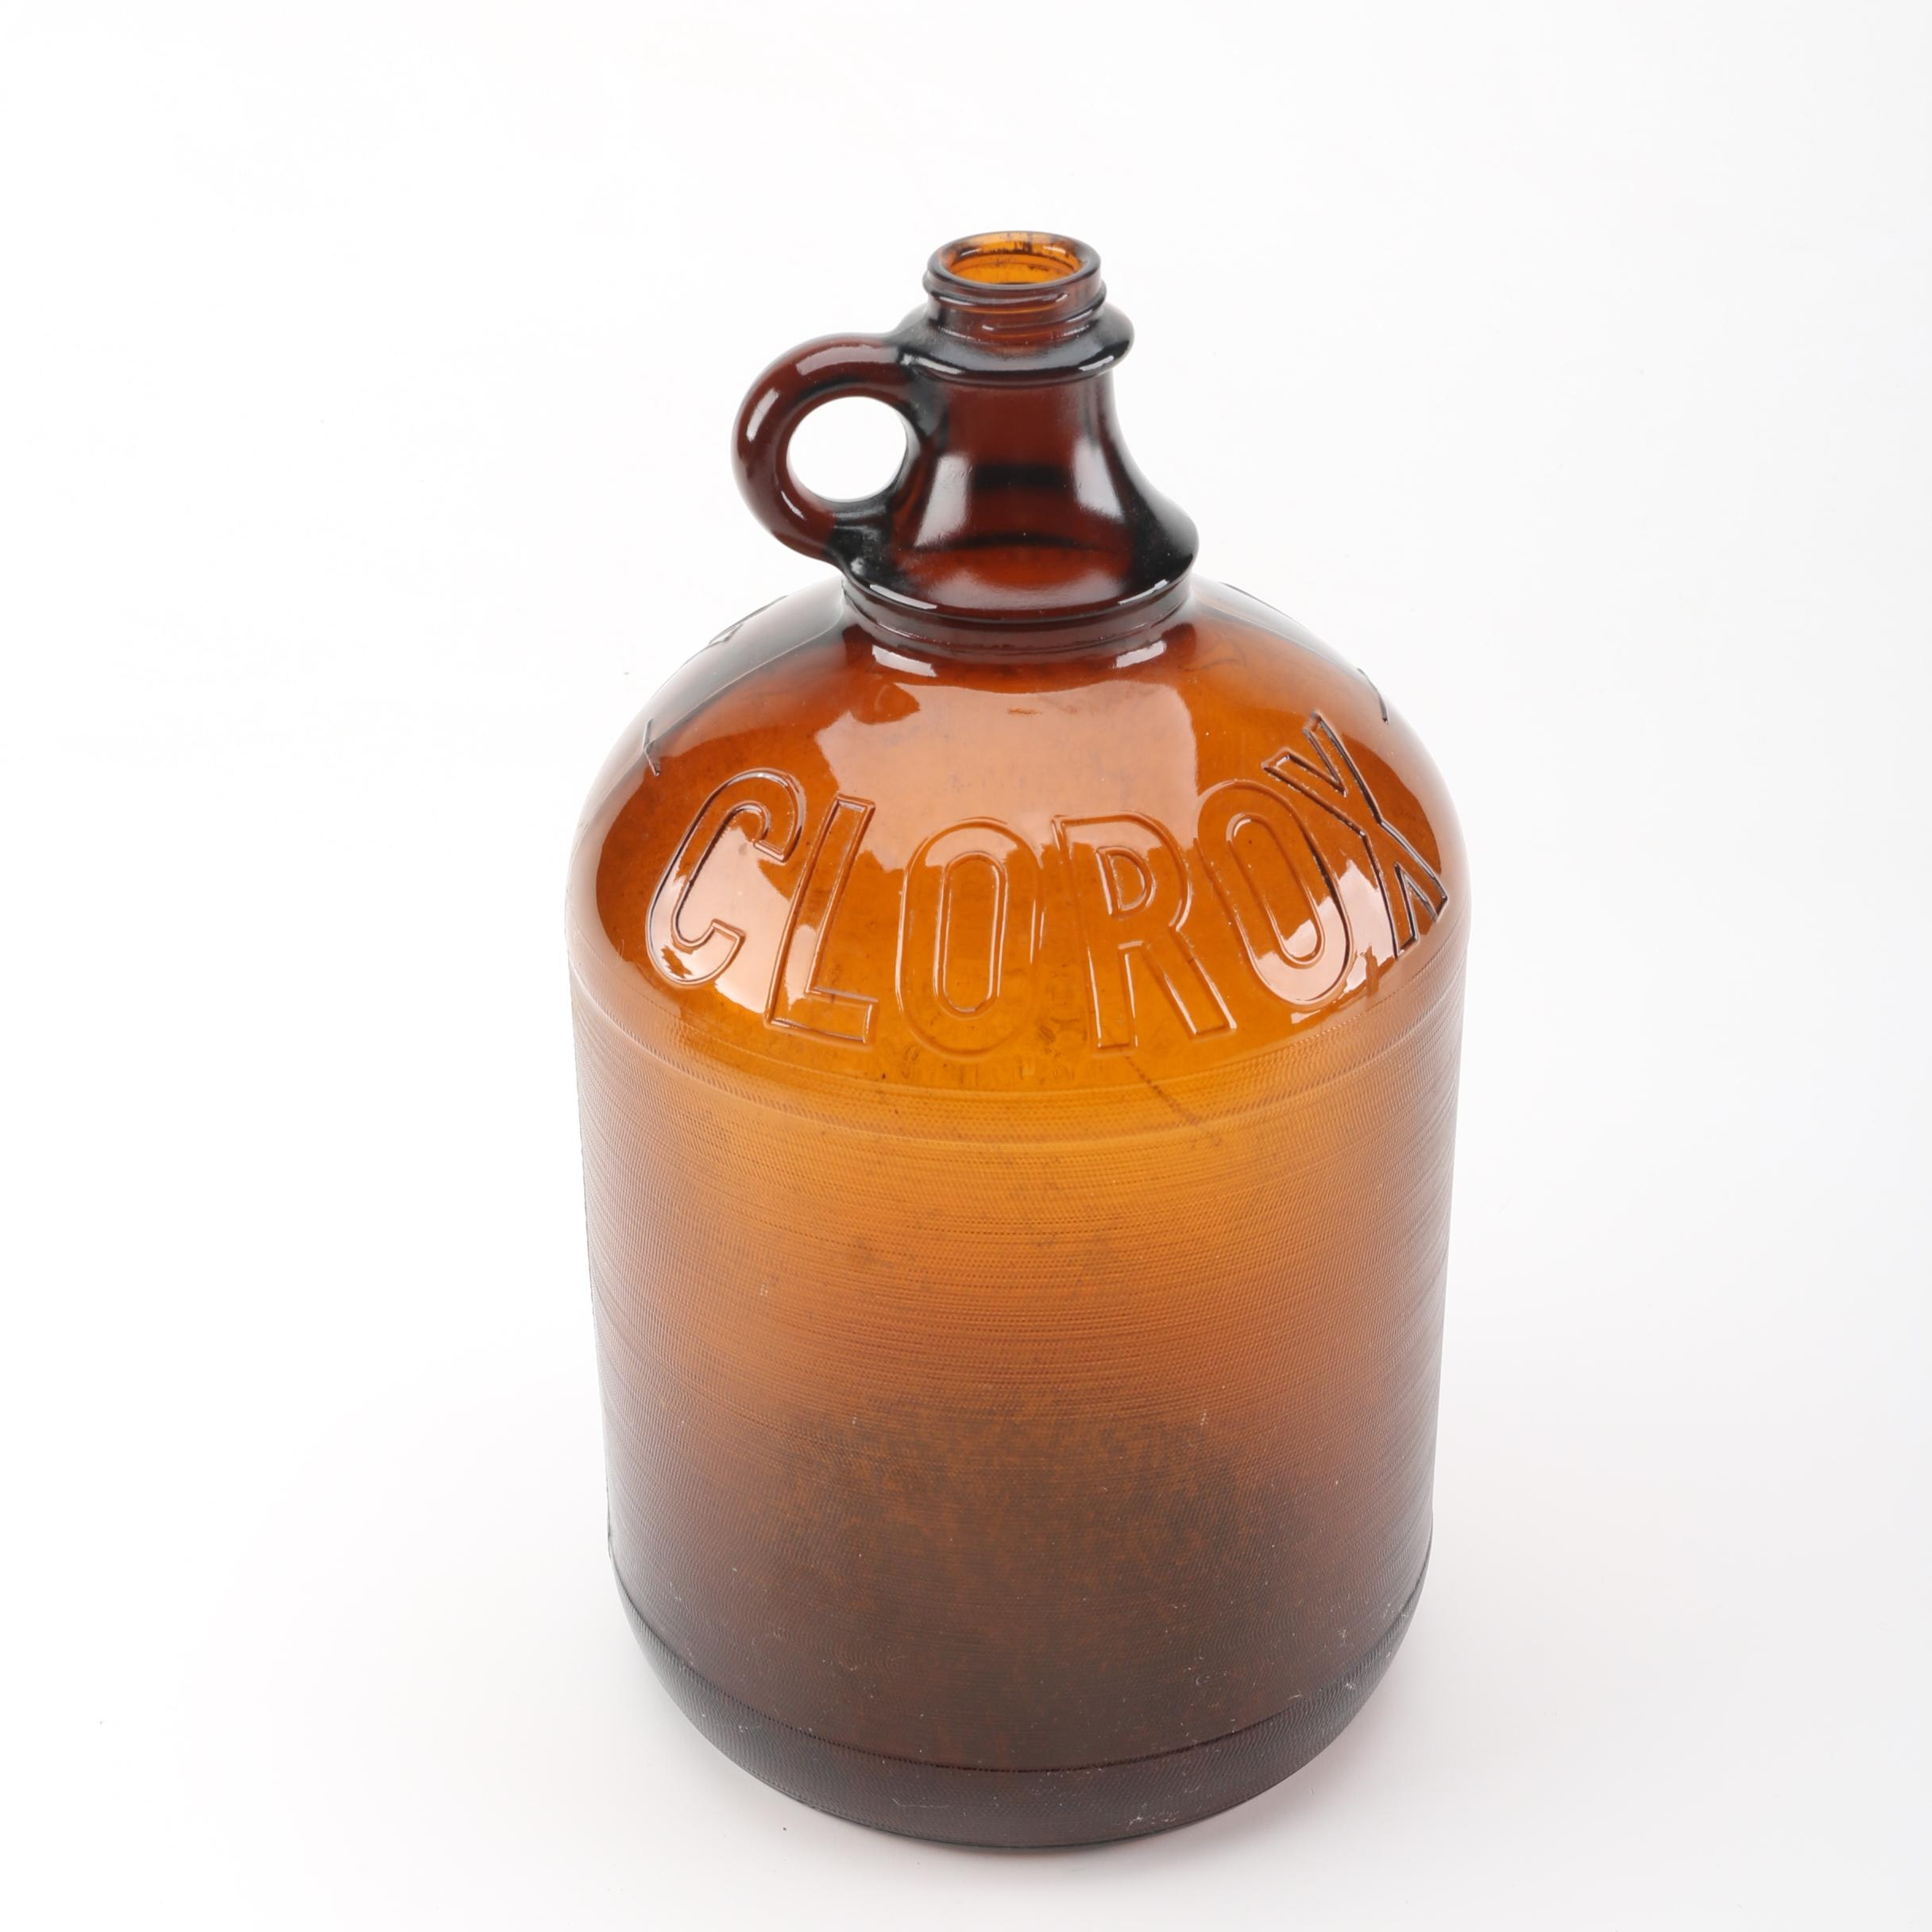 Clorox Glass Bottle